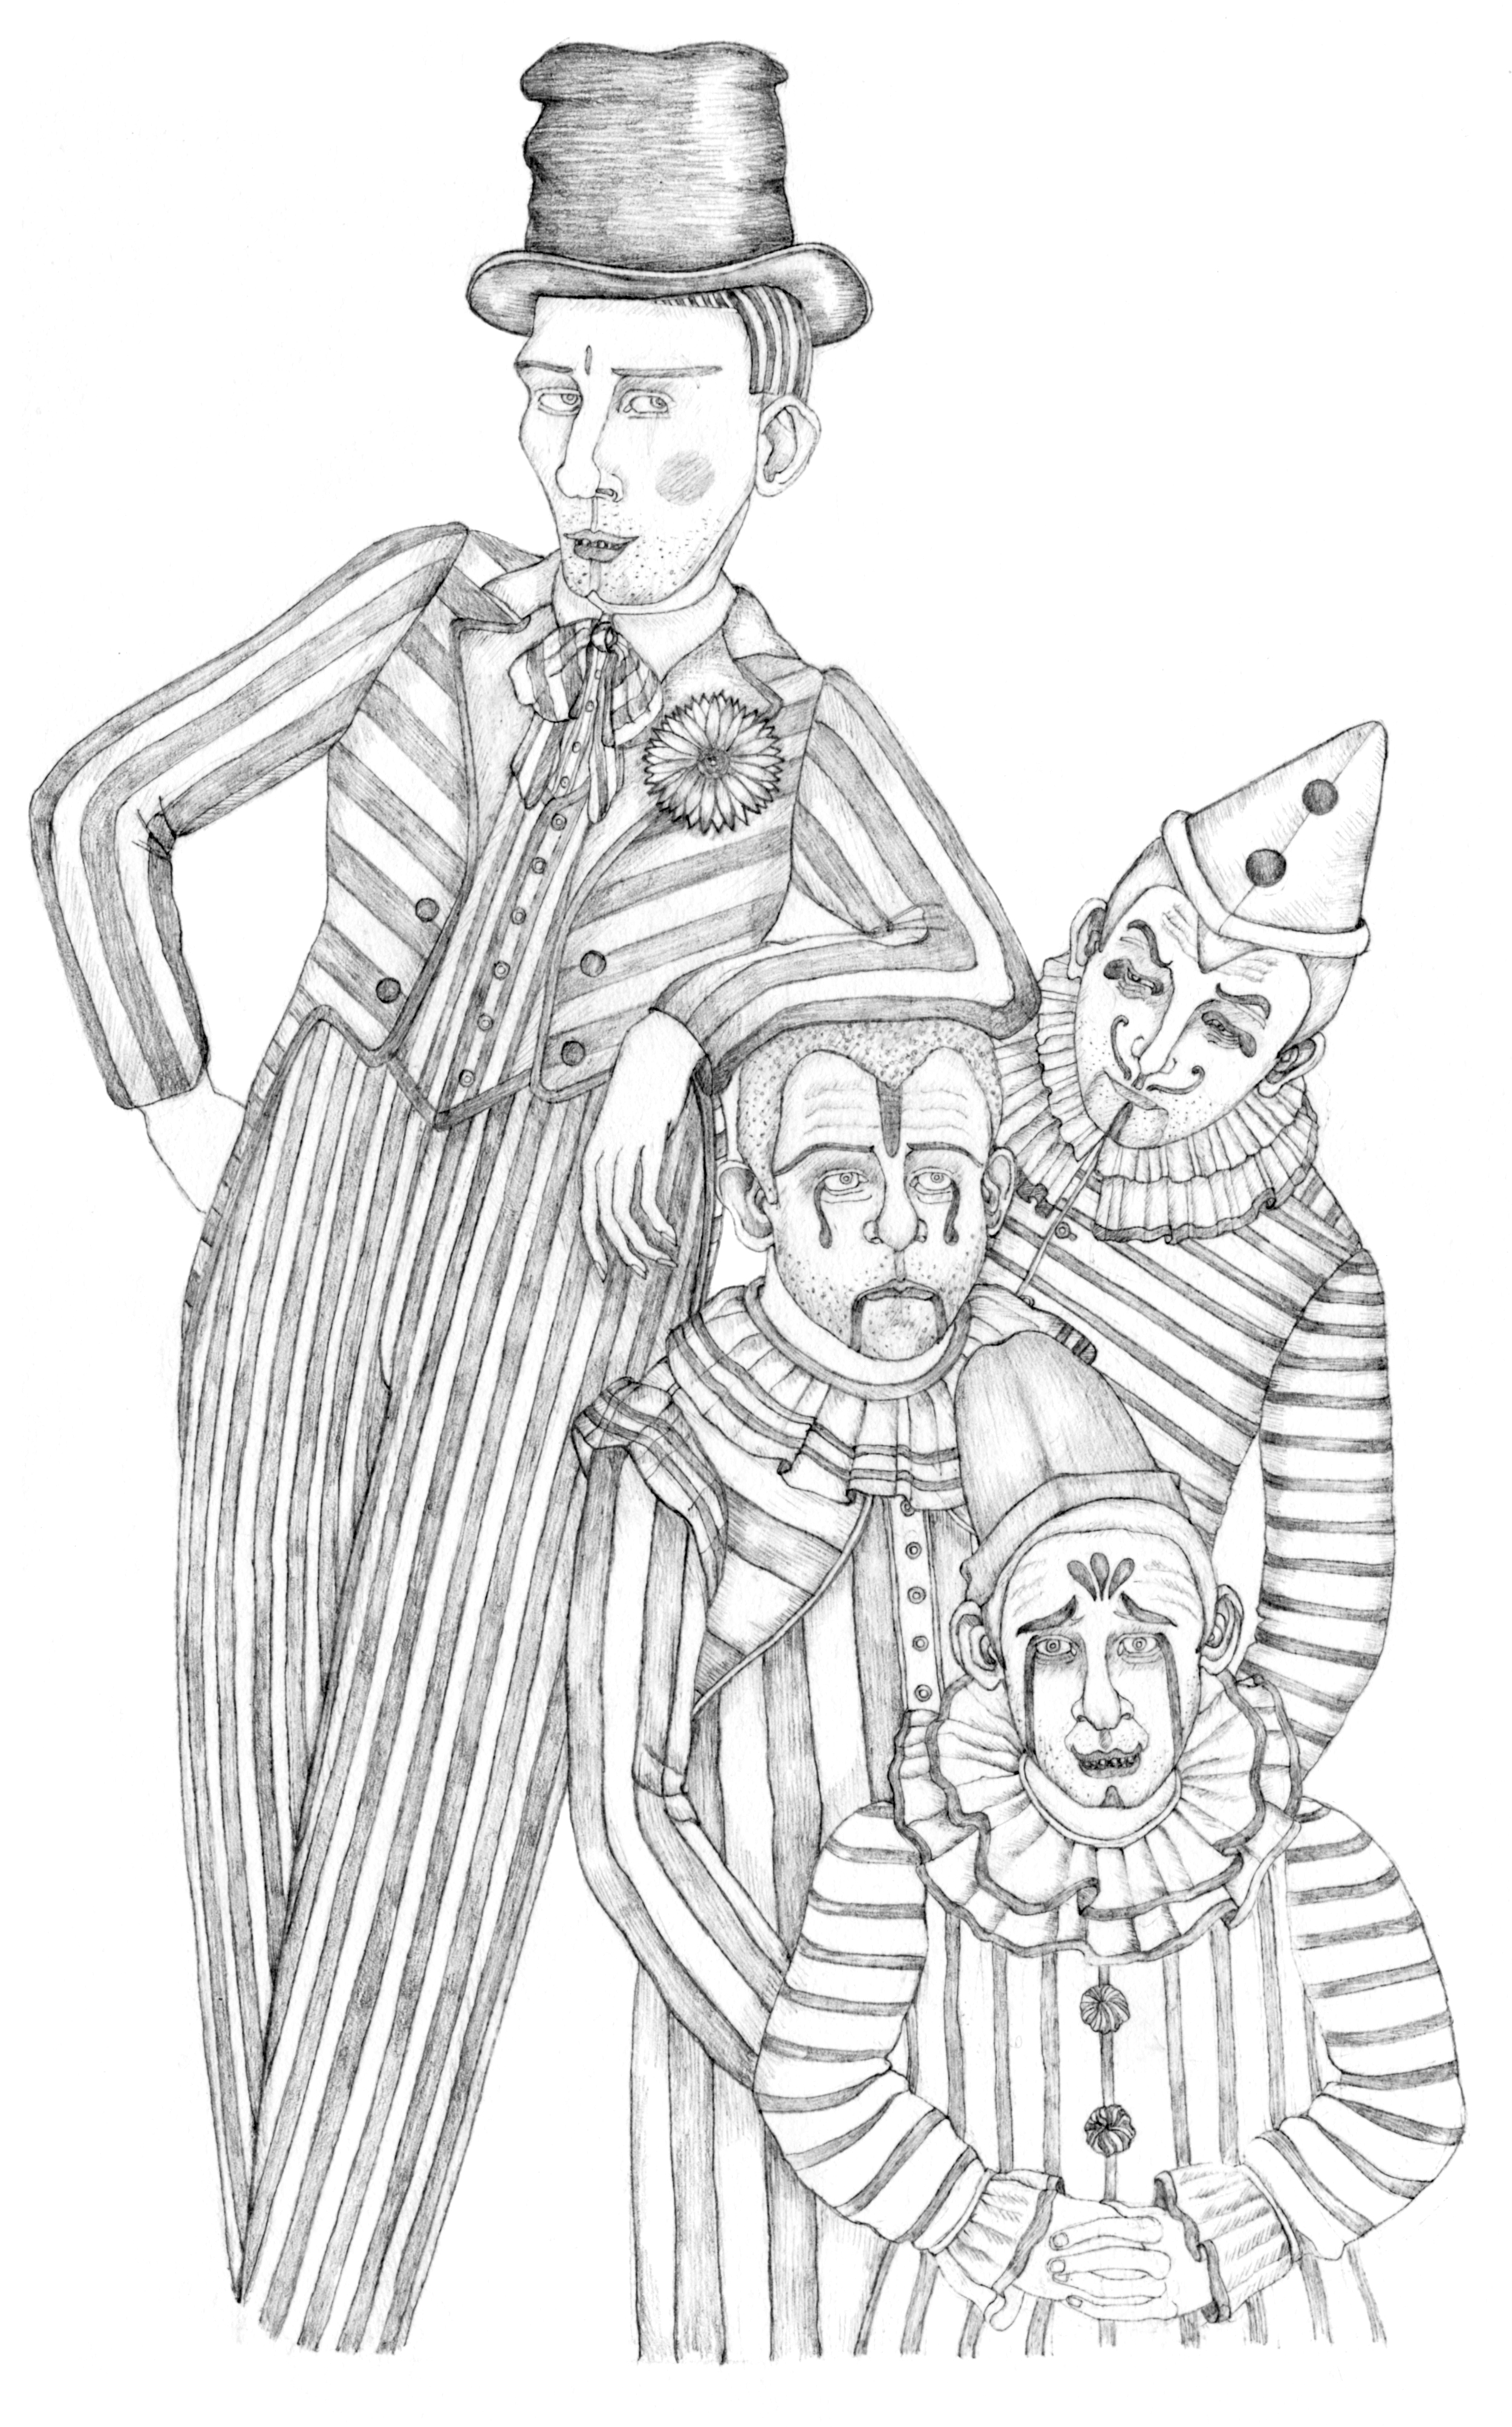 p12_Pershing&Clowns_HiRes.jpg